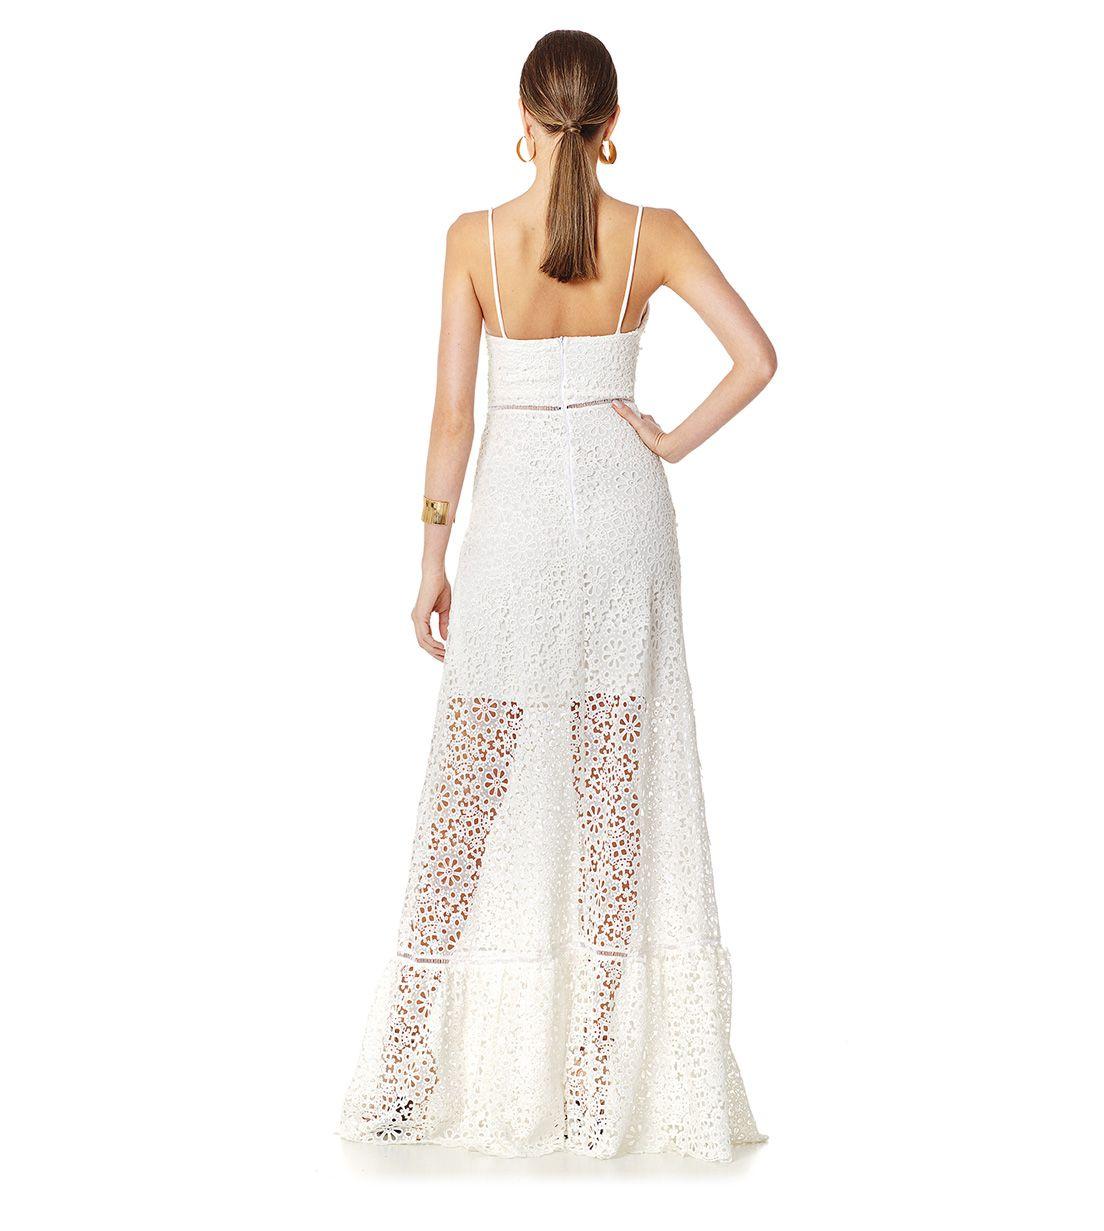 Vestido Longo Guipir Branco Lala Dubi